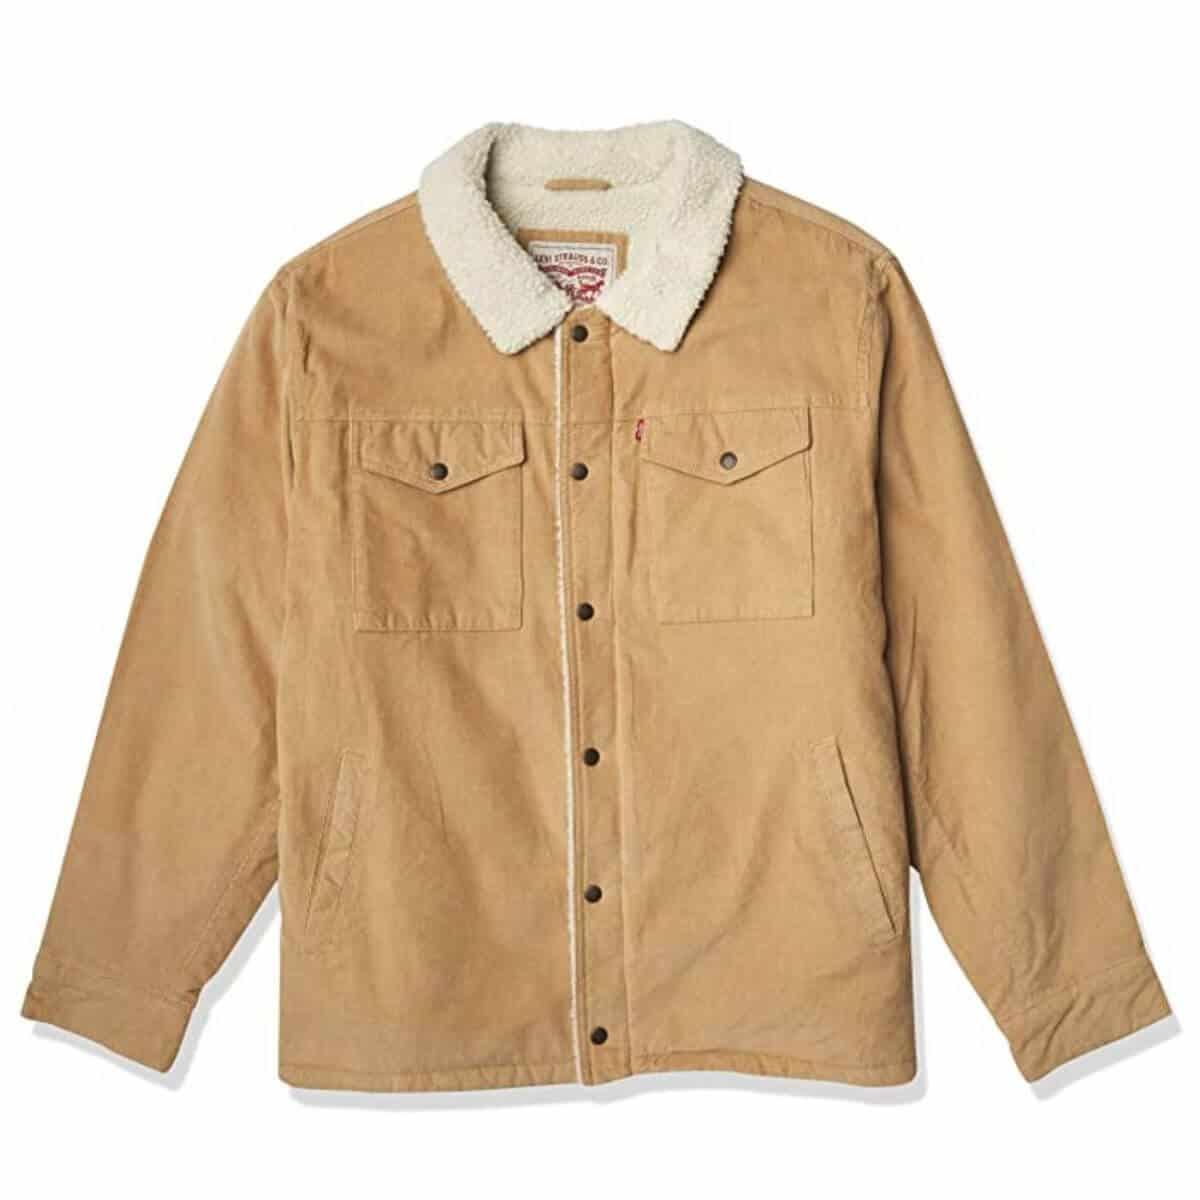 Tan corduroy trucker jacket with sherpa lining.